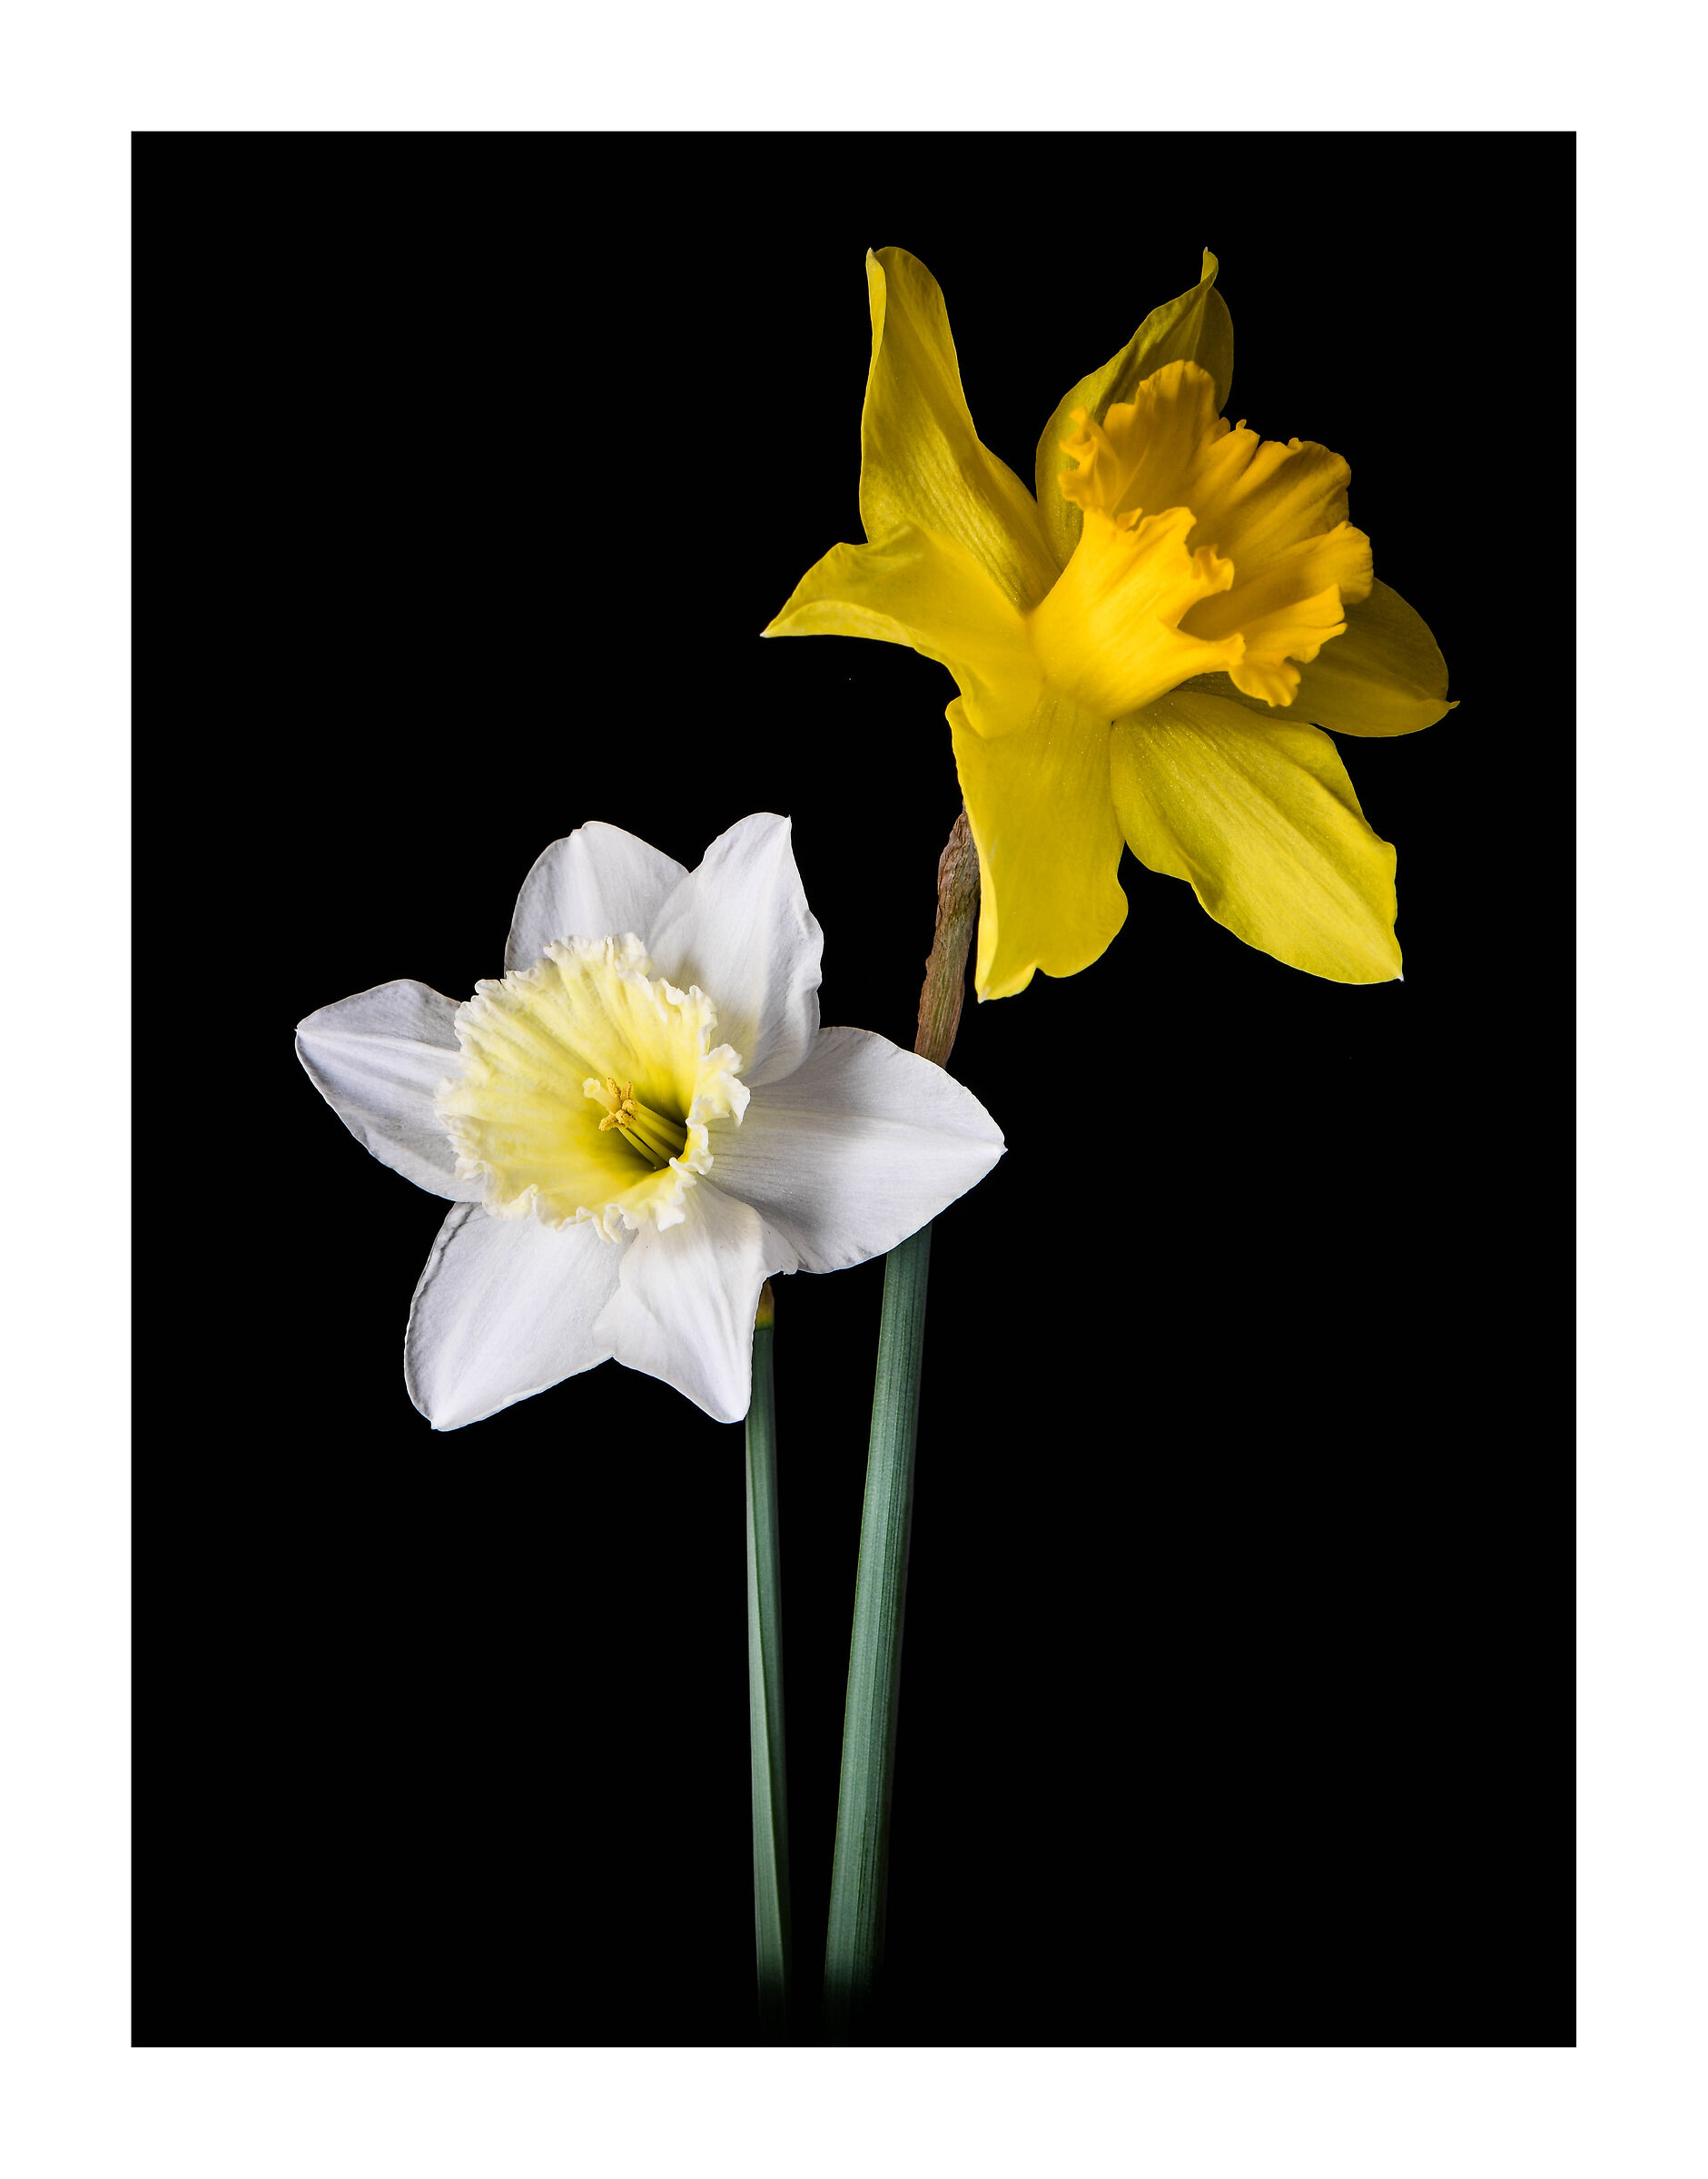 Coppia di Narcisi....